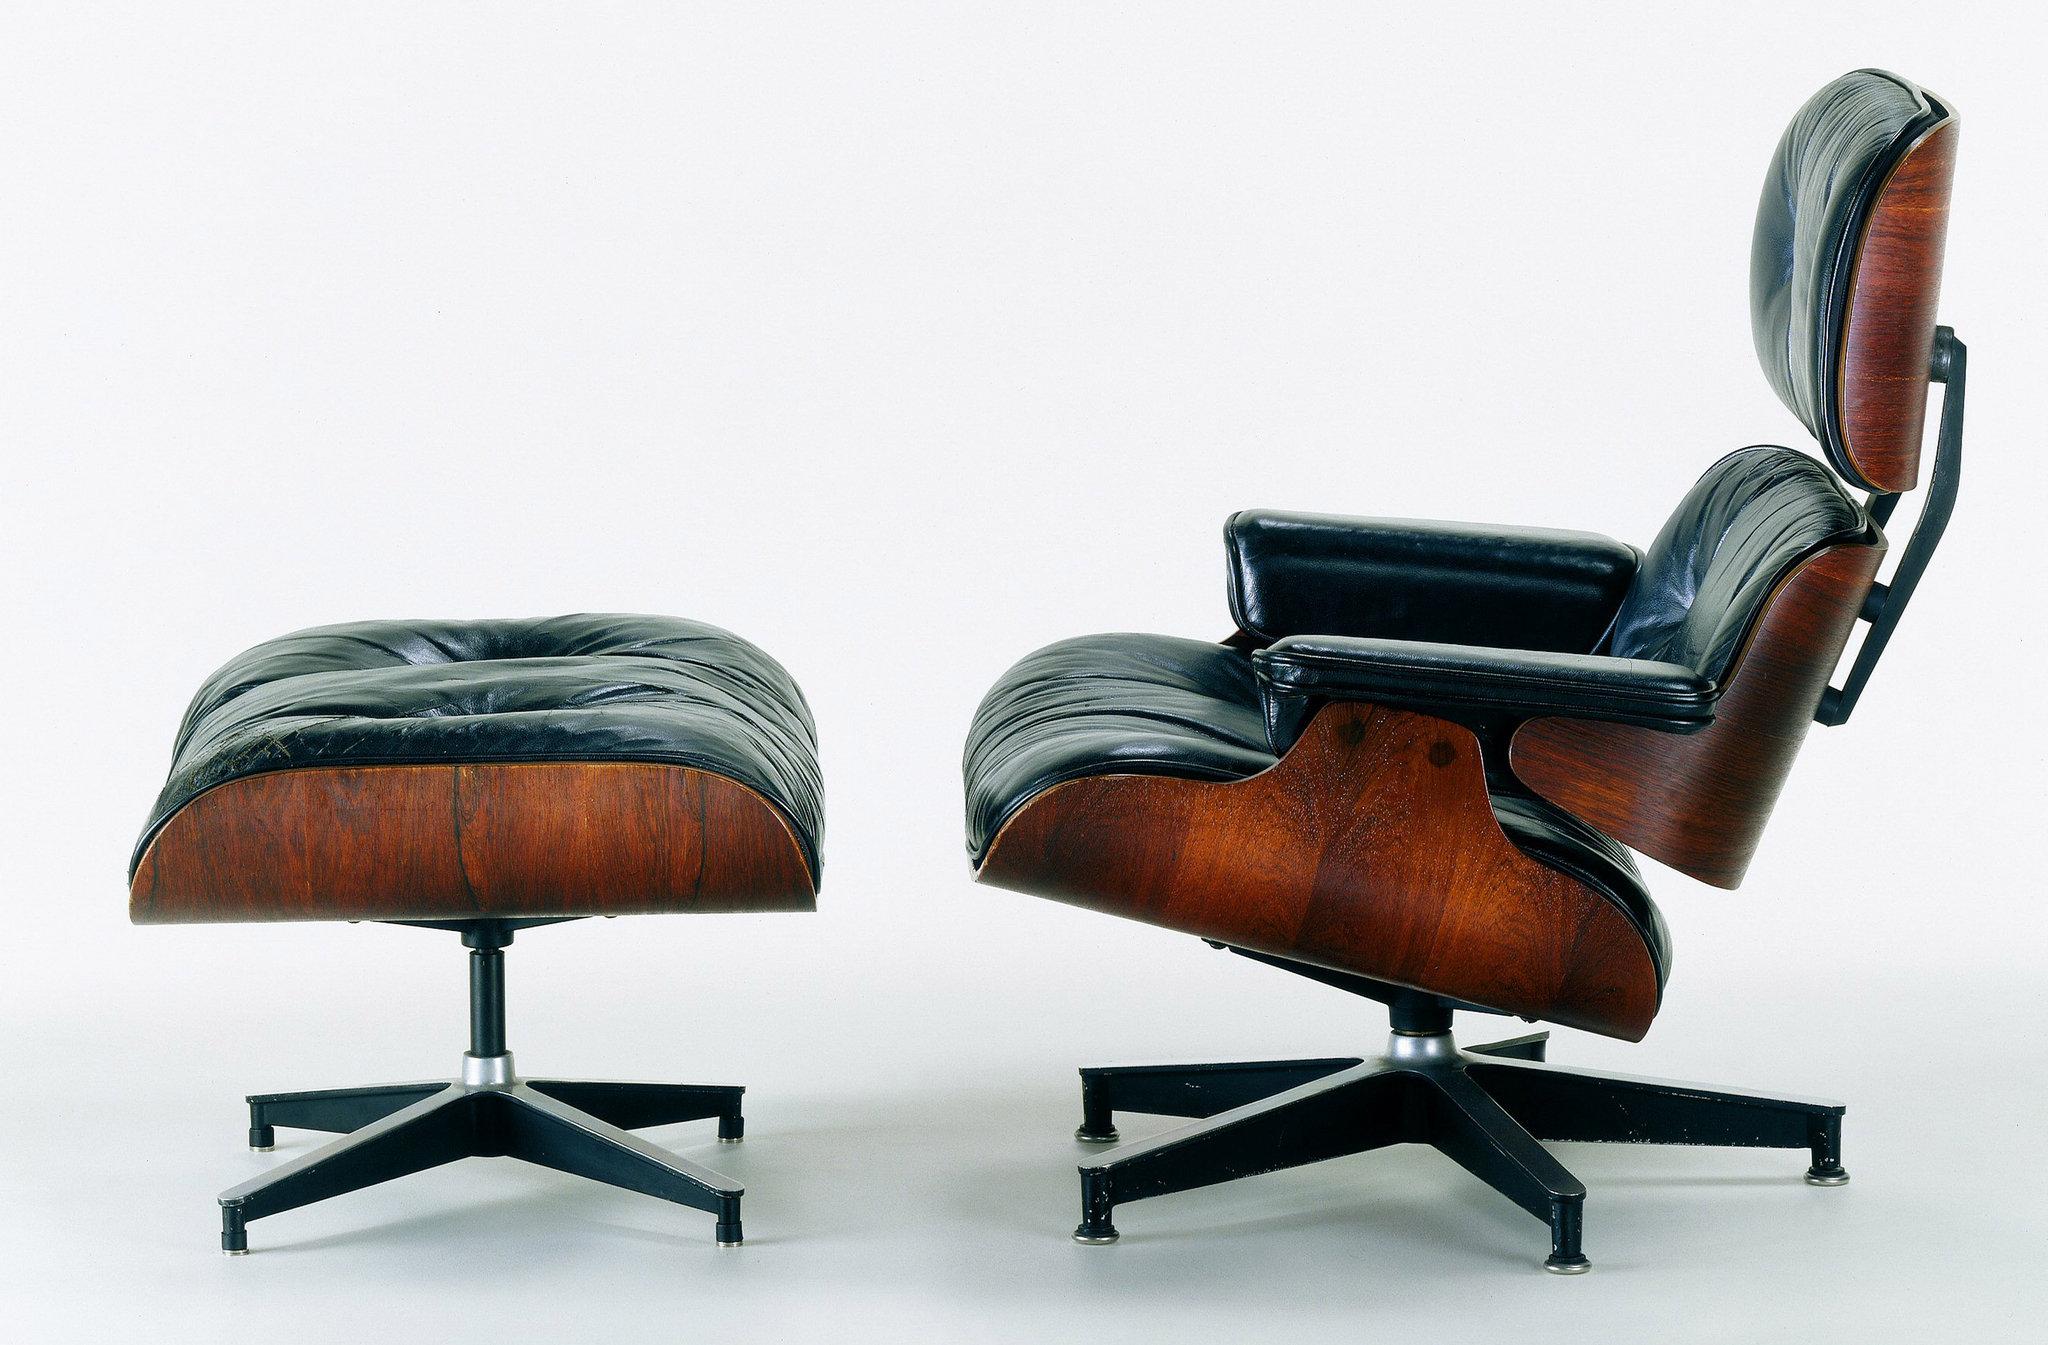 Famous Furniture Designs